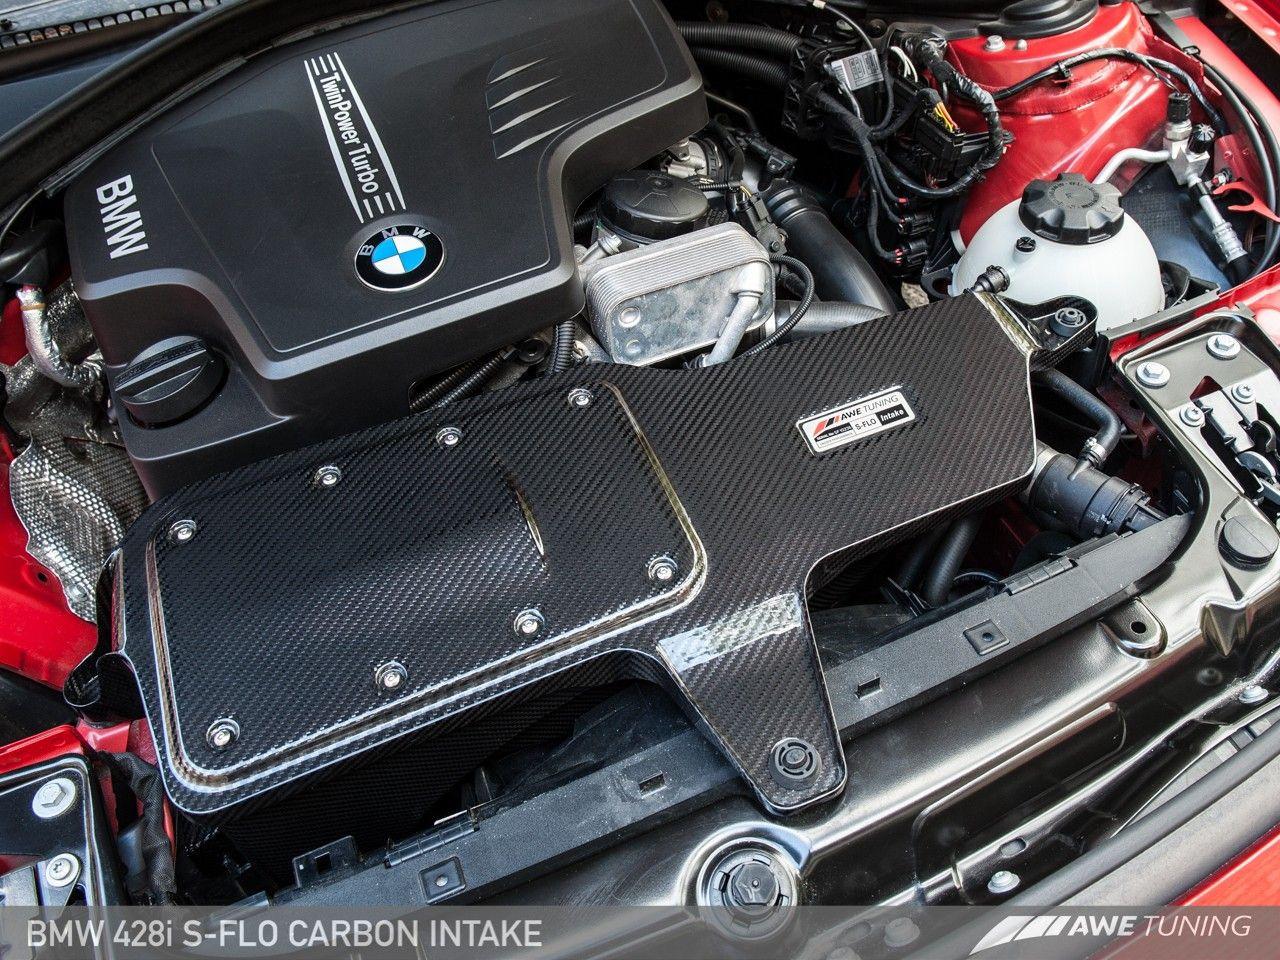 Awe Tuning S Flo Carbon Intake For 2012 Bmw 228i 328i 428i F22 F30 F32 2660 13034